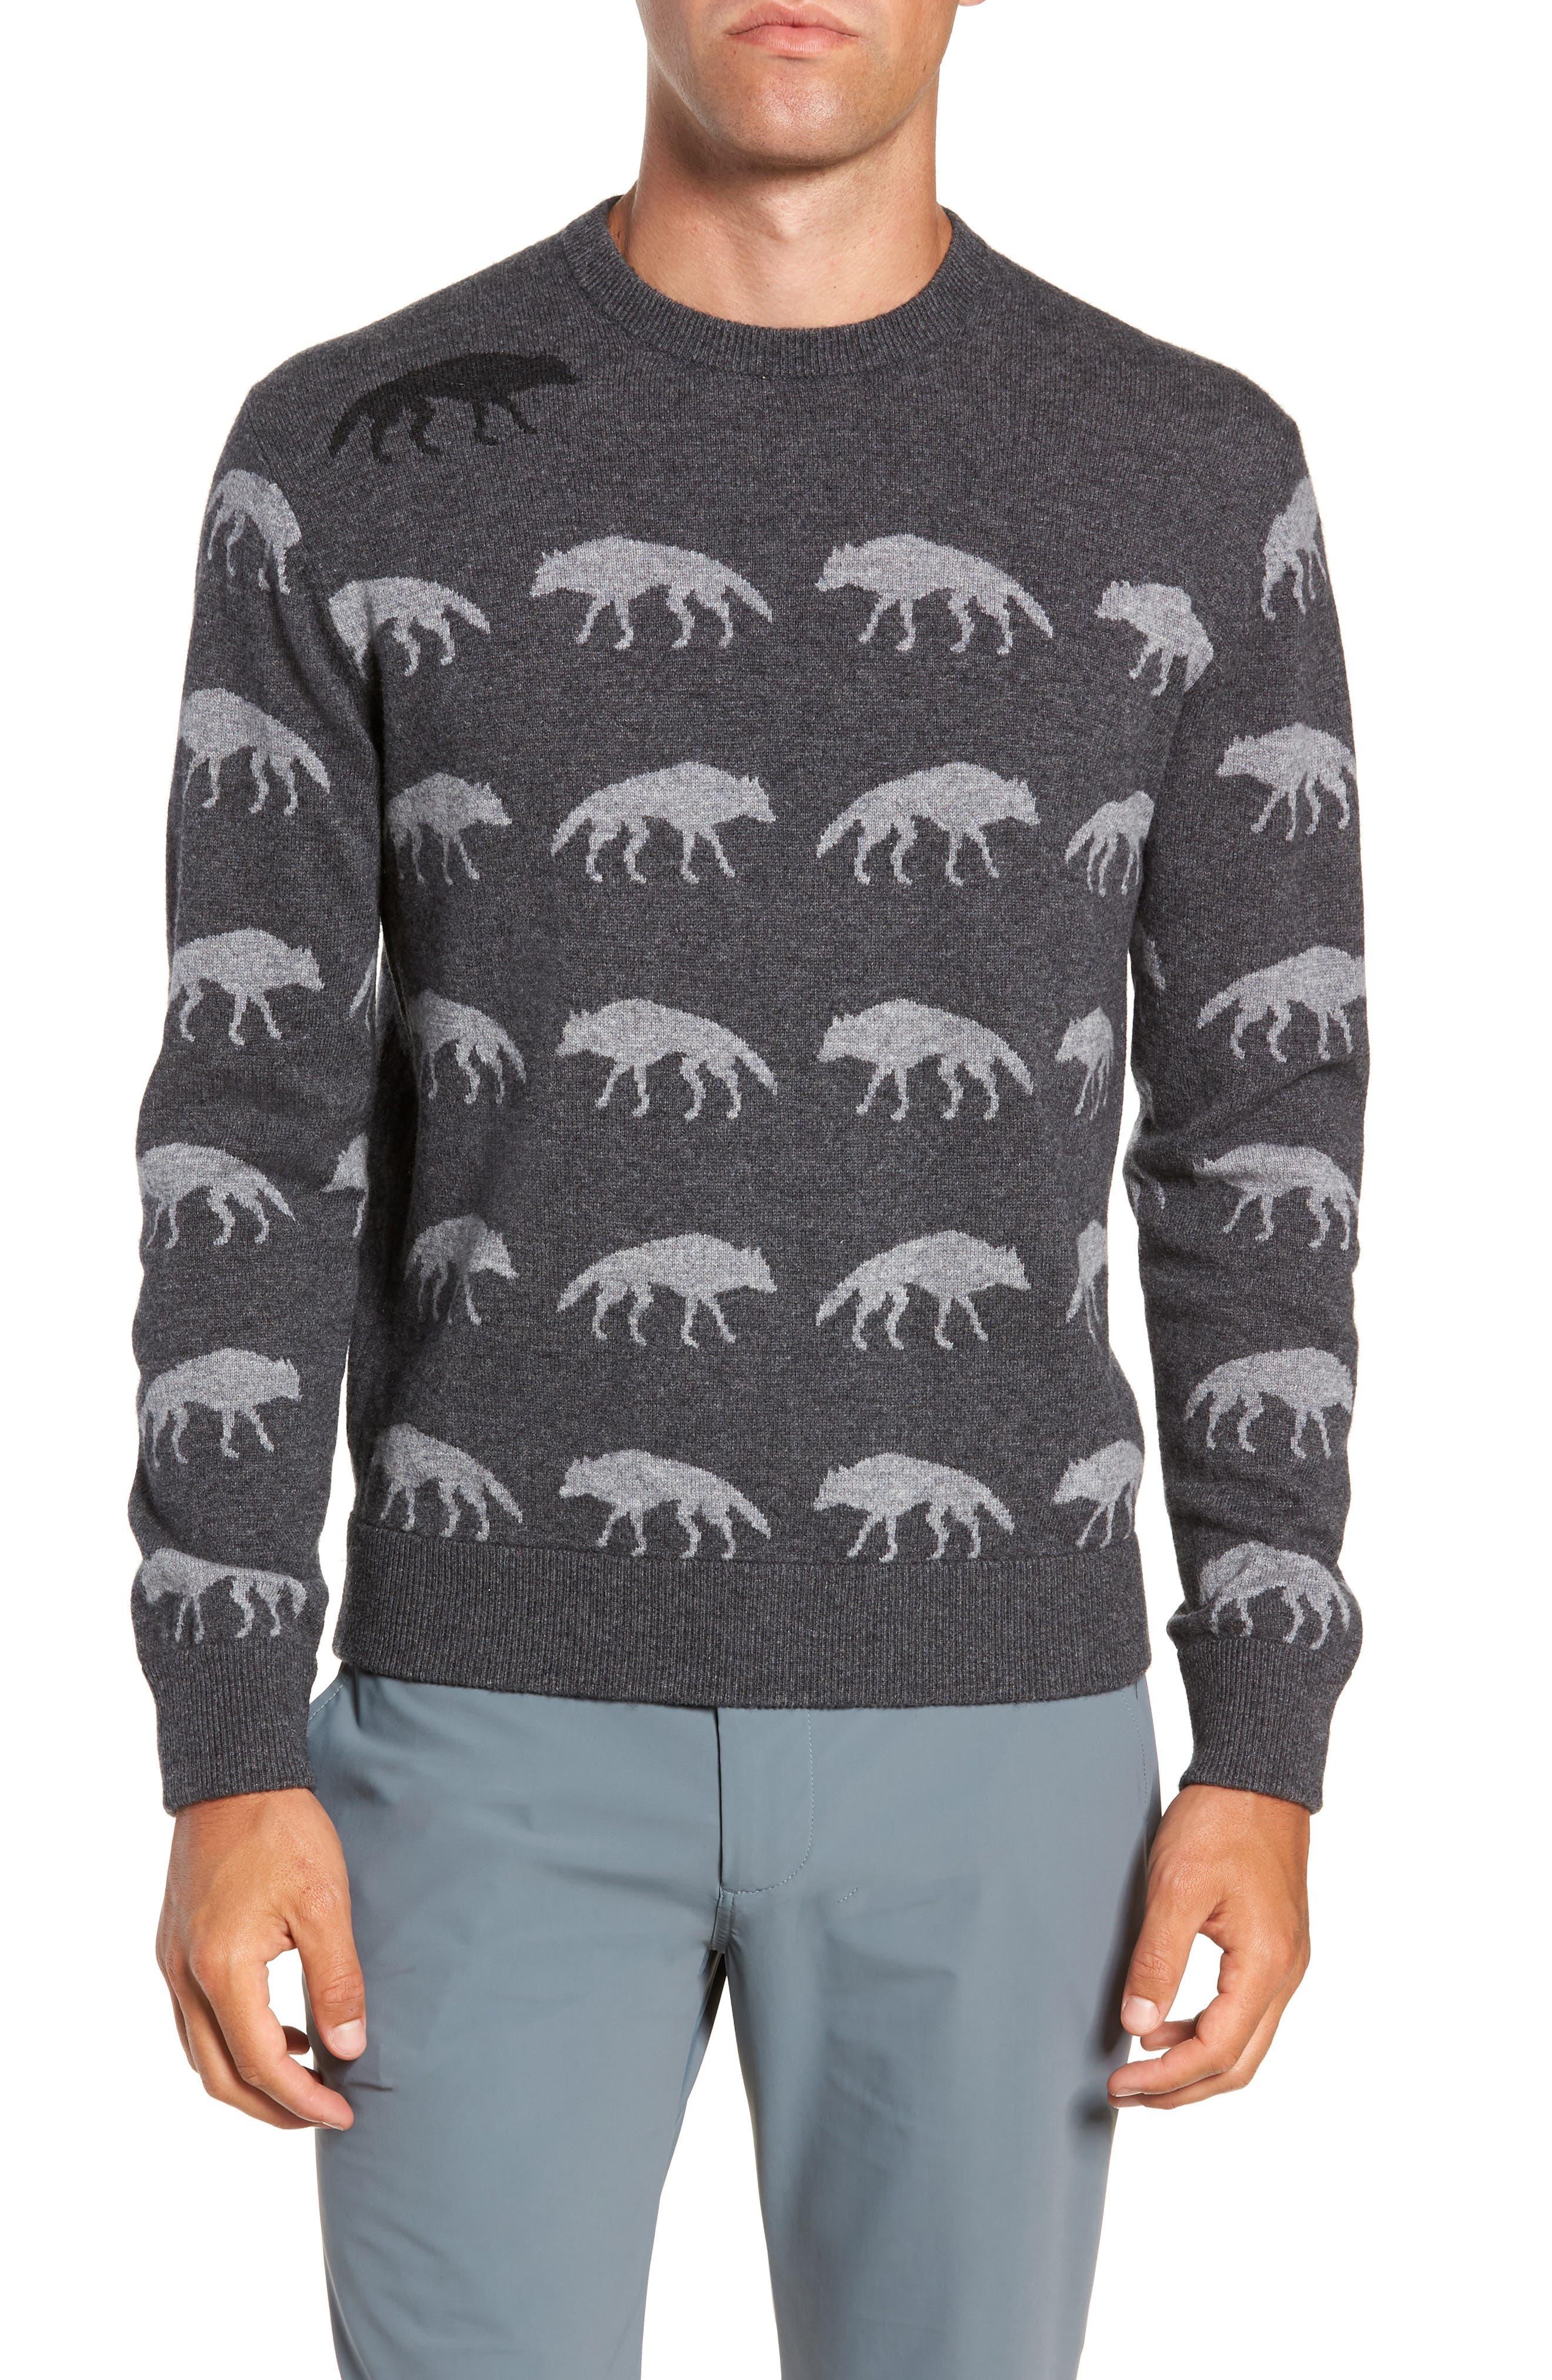 Alphawolf Intarsia Crewneck Sweater,                         Main,                         color, GREY HEATHER